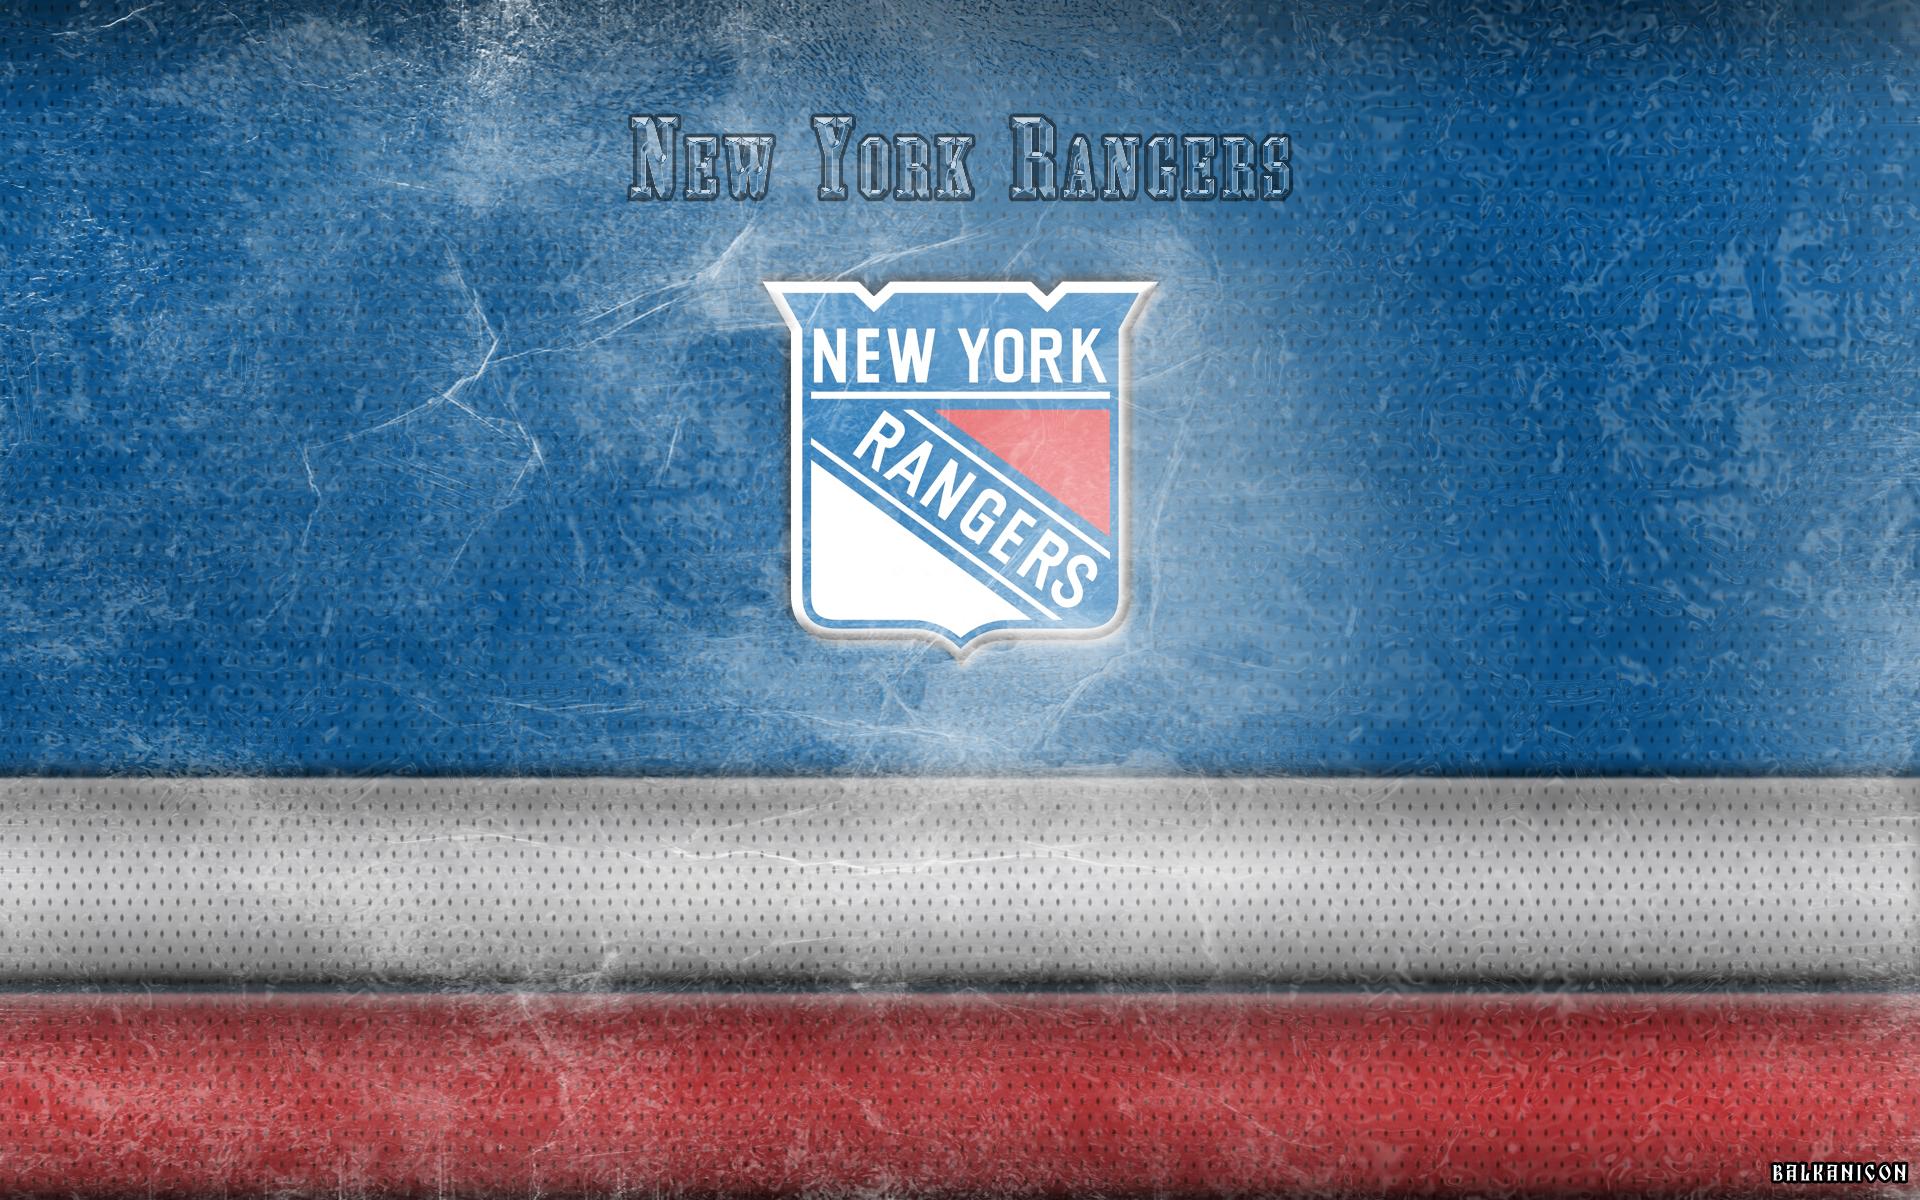 New York Rangers wallpaper by